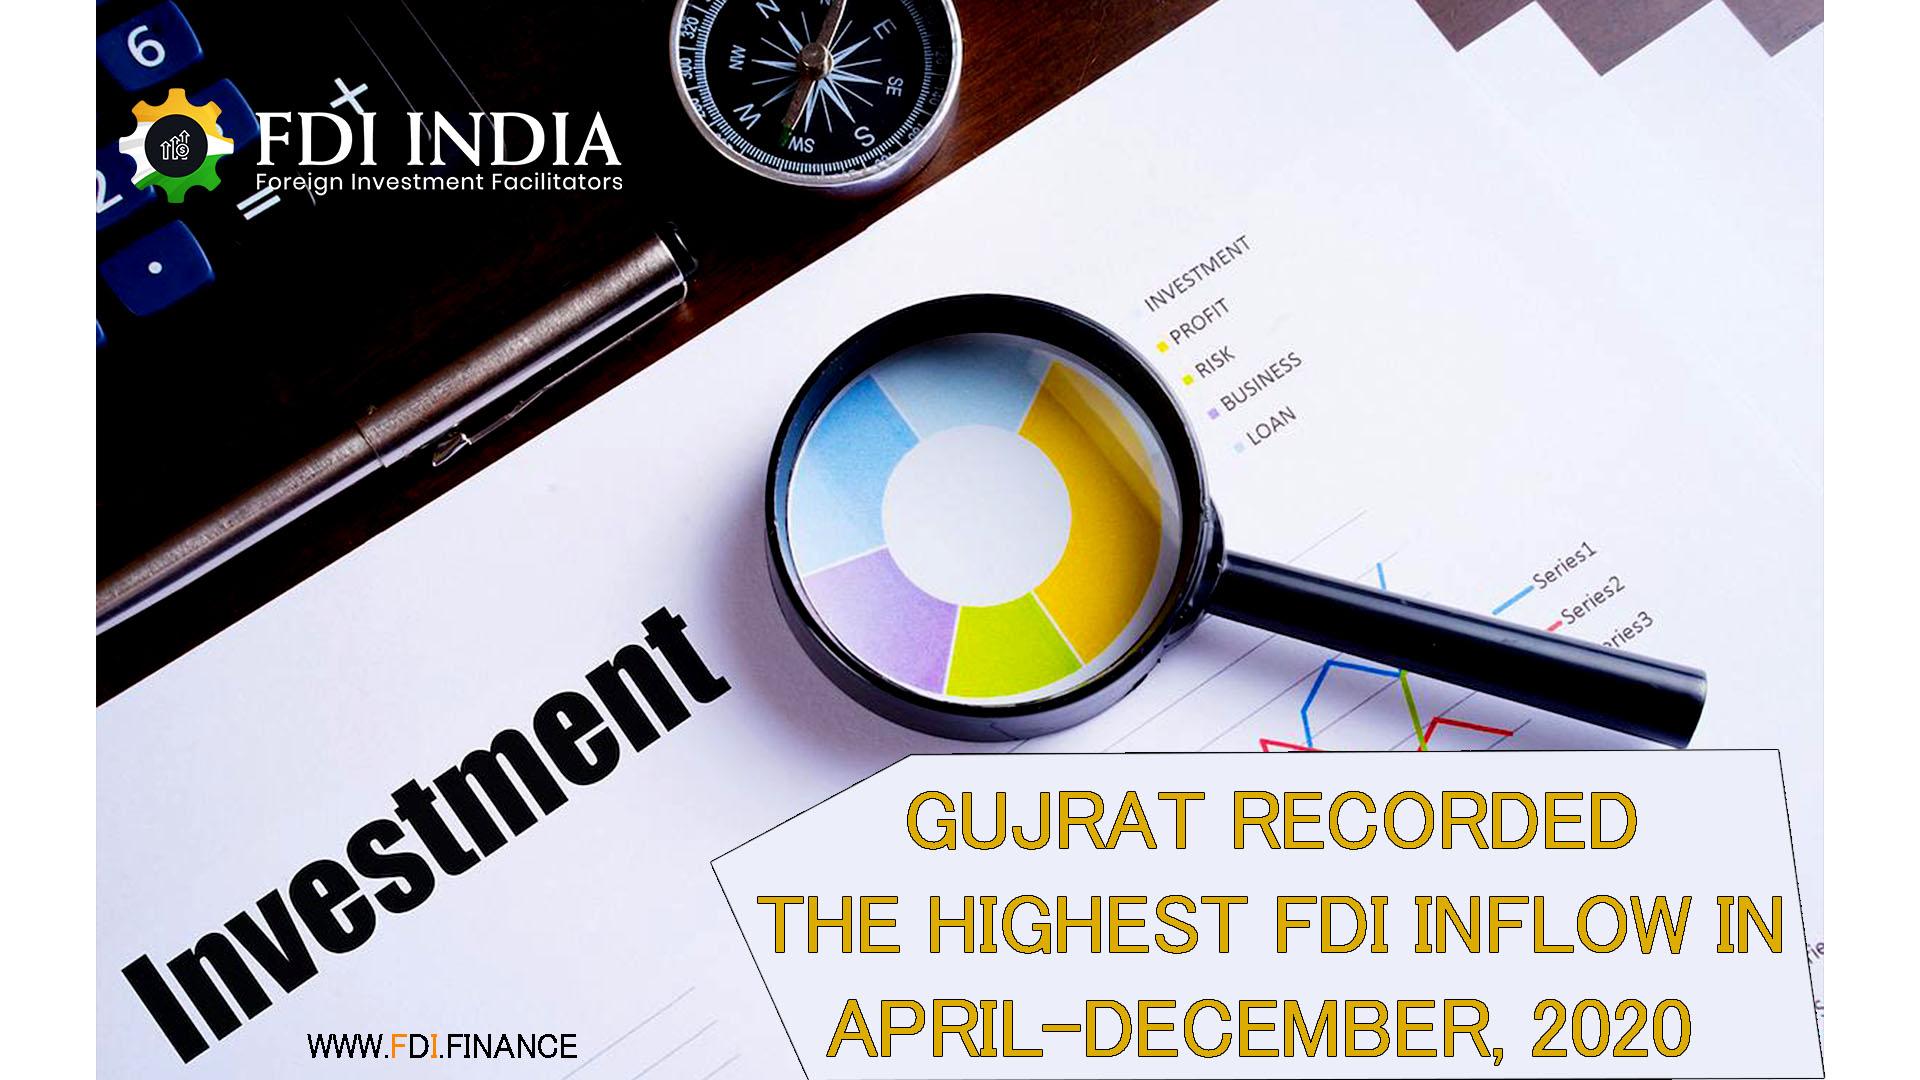 Gujrat Recorded The Highest FDI Inflow In April-December, 2020